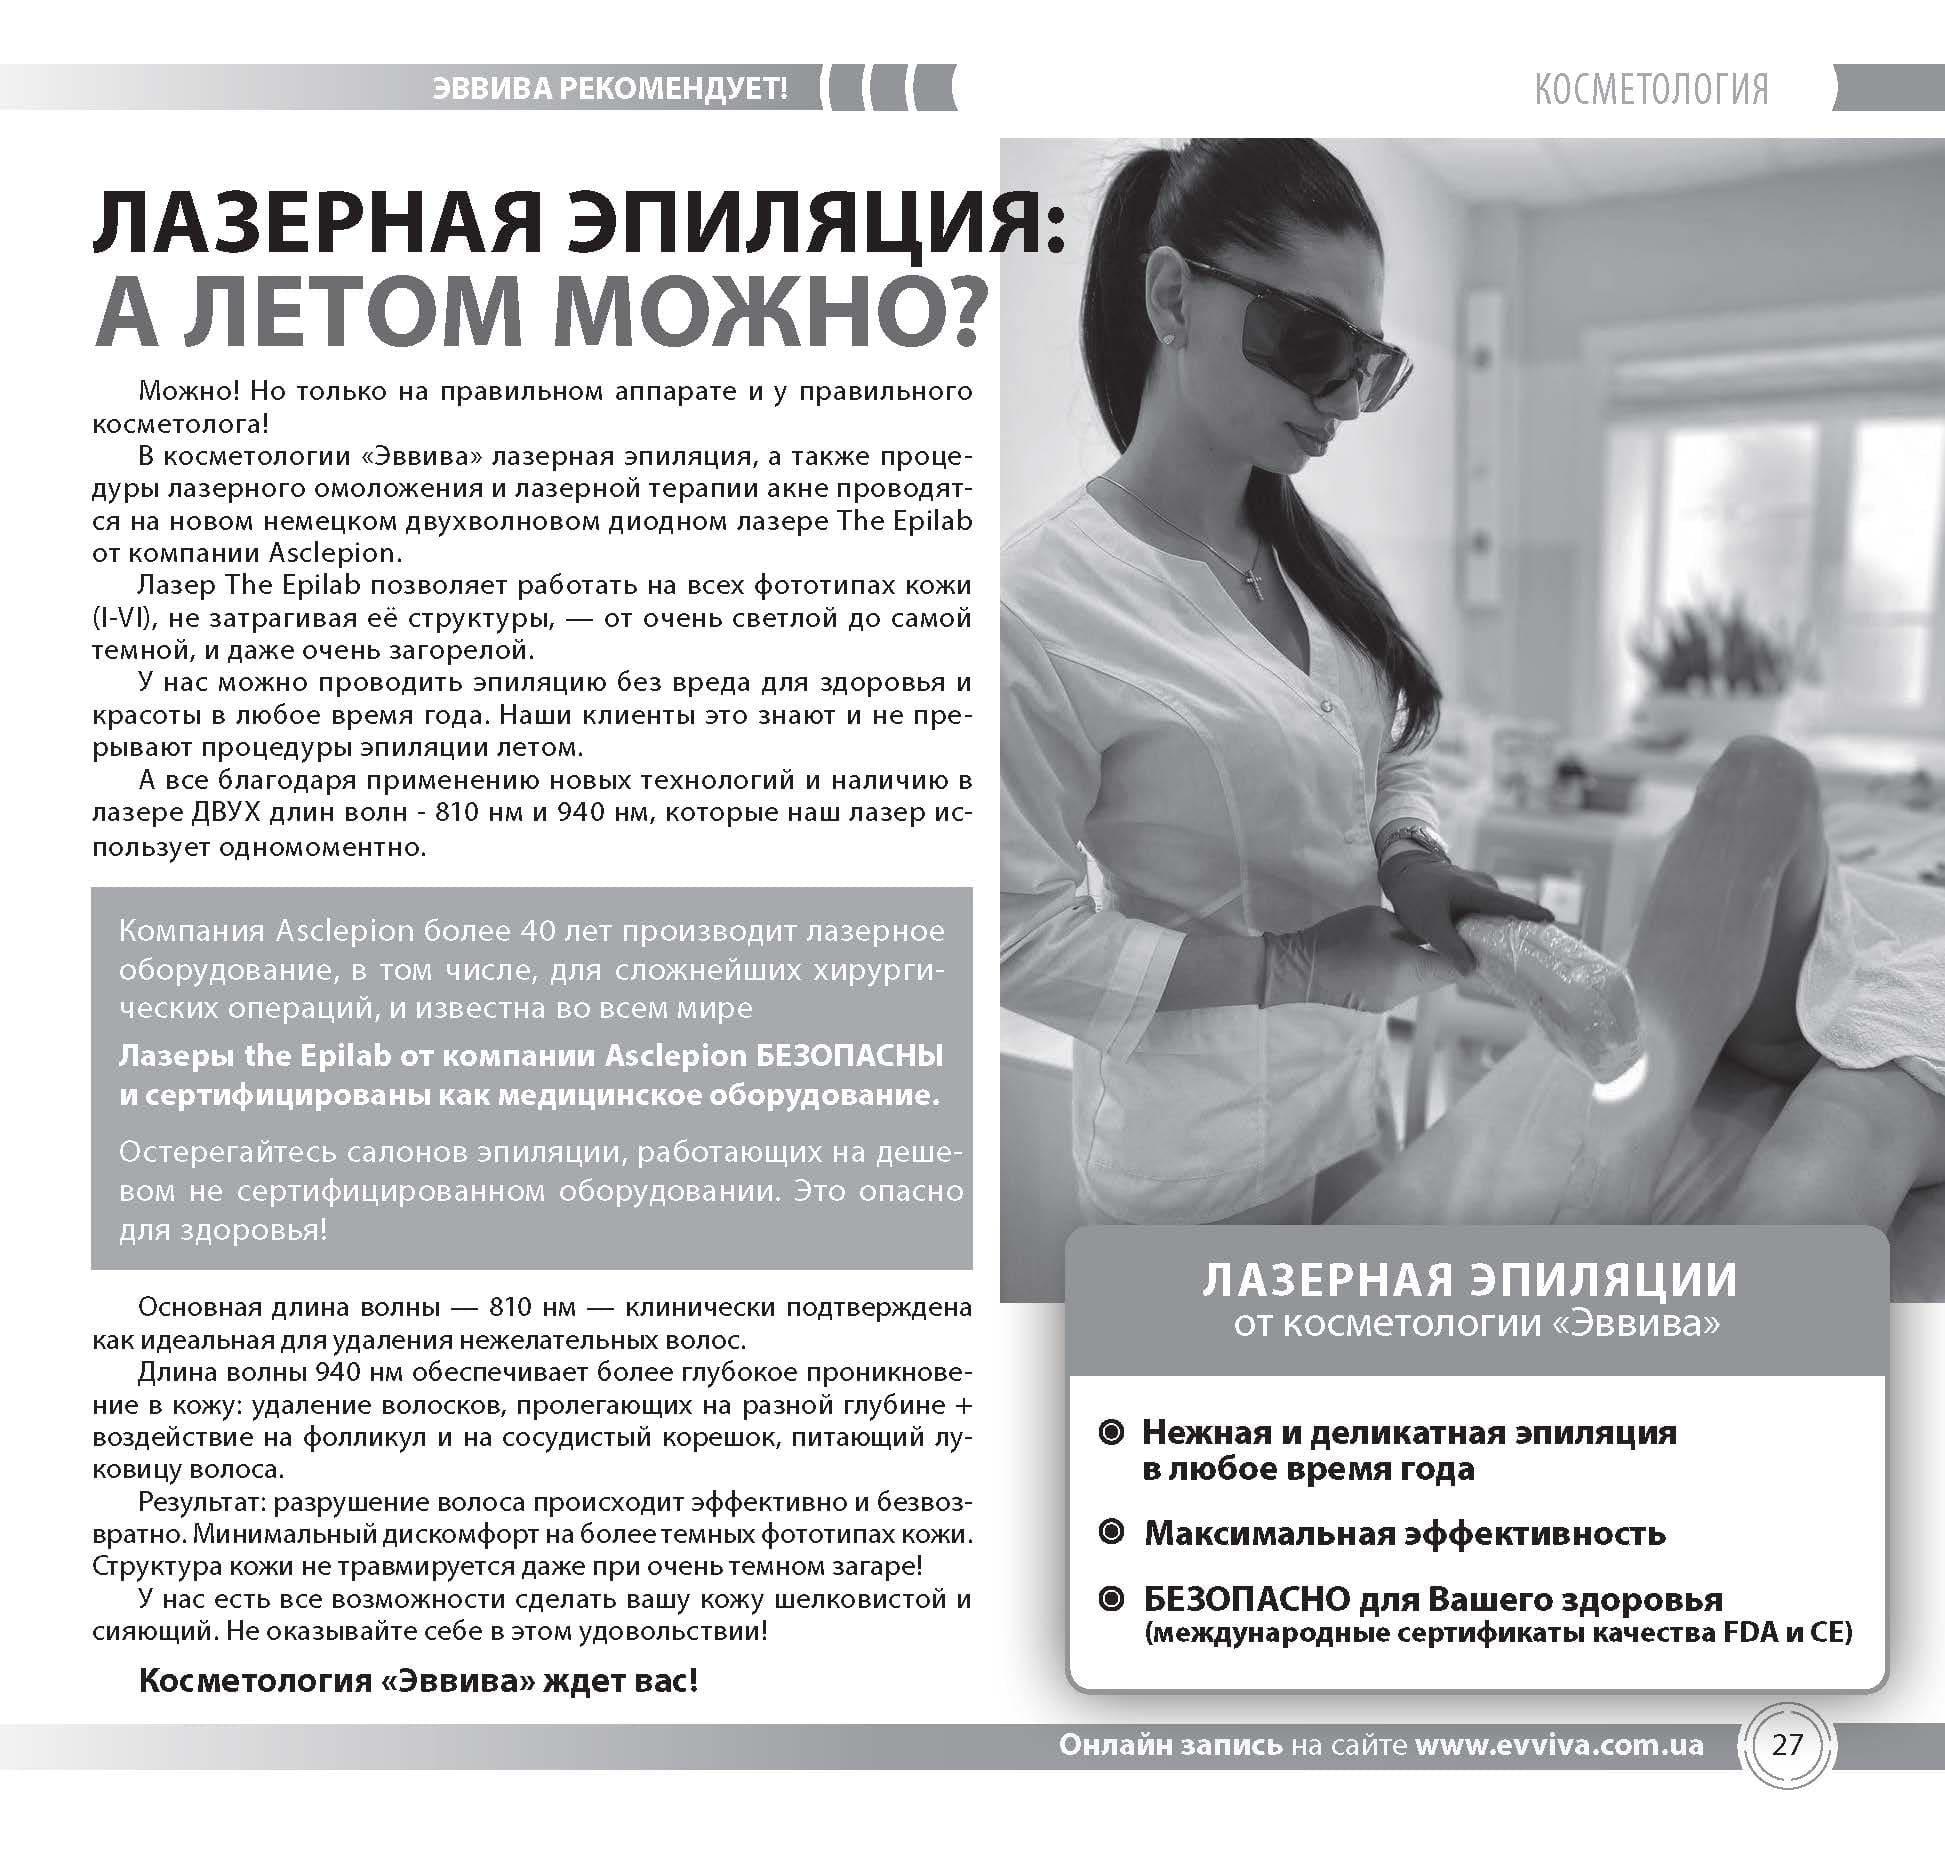 evviva-zhurnal-119-page27